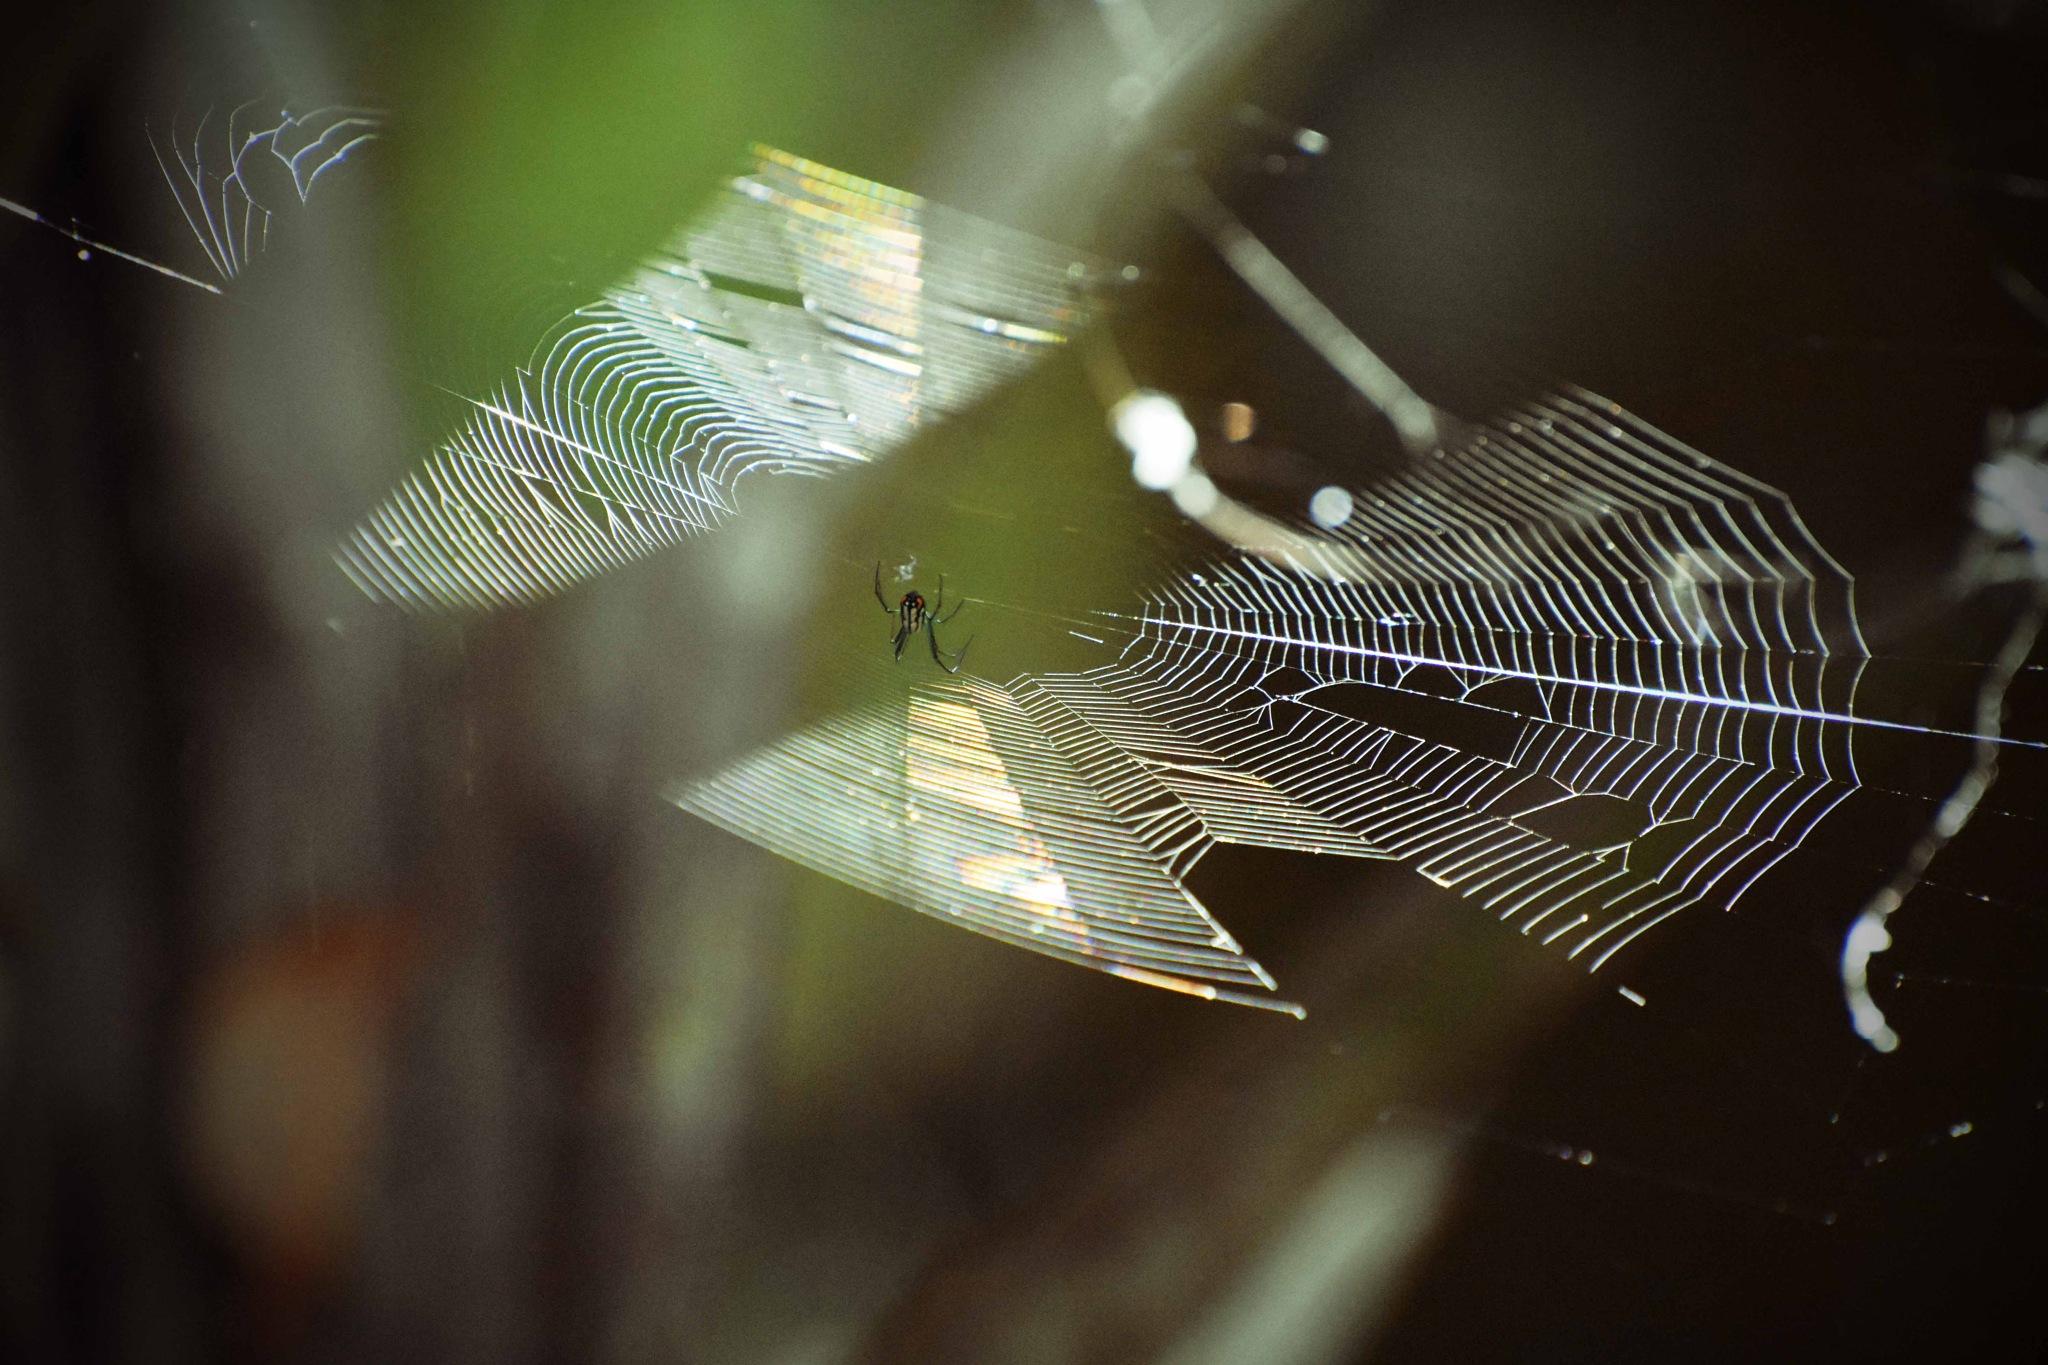 Swamp Spider by stacey legg